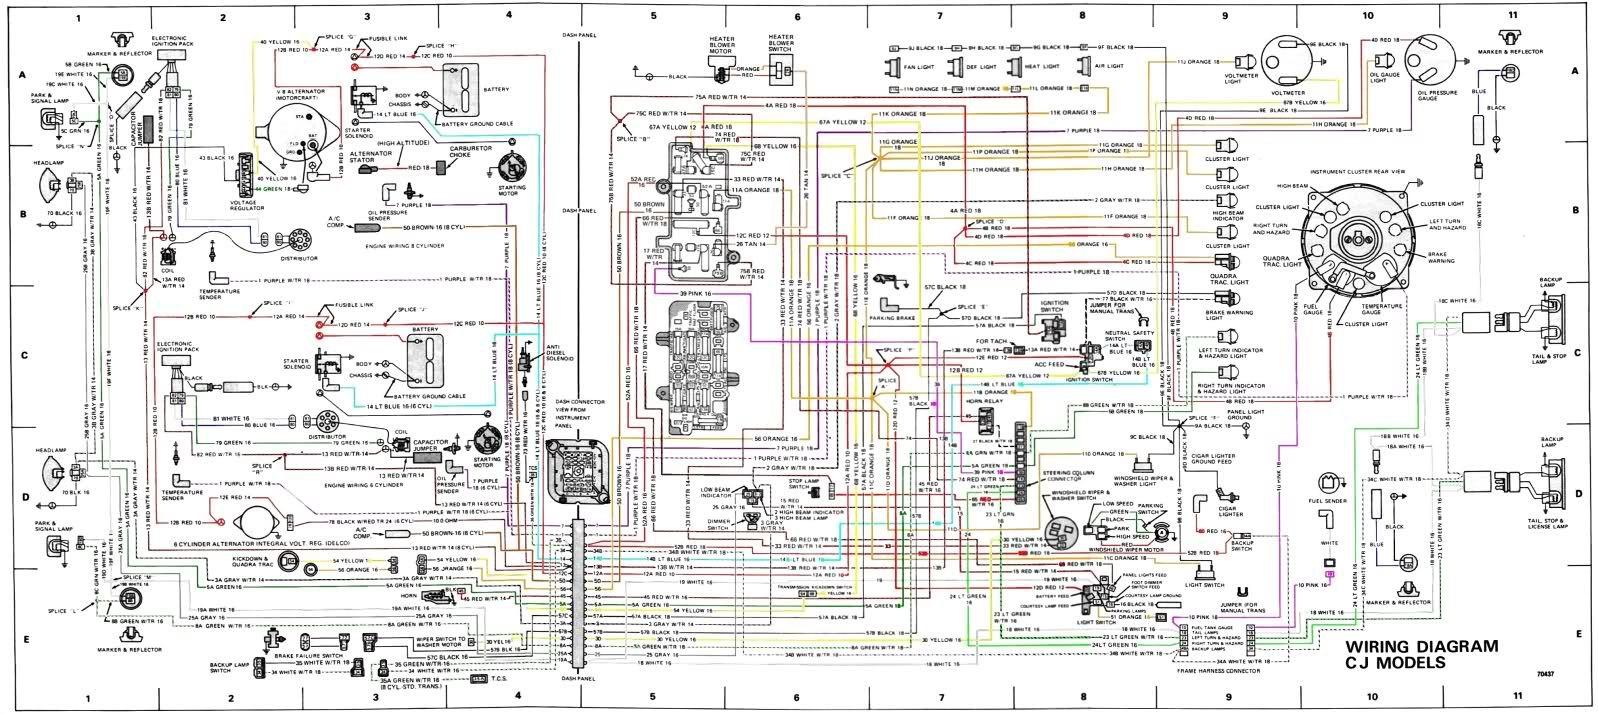 ah_4048] jeep cj starter solenoid wiring diagram further jeep cj7 ... 1980 cj5 wiring schematic for  joami exmet mohammedshrine librar wiring 101